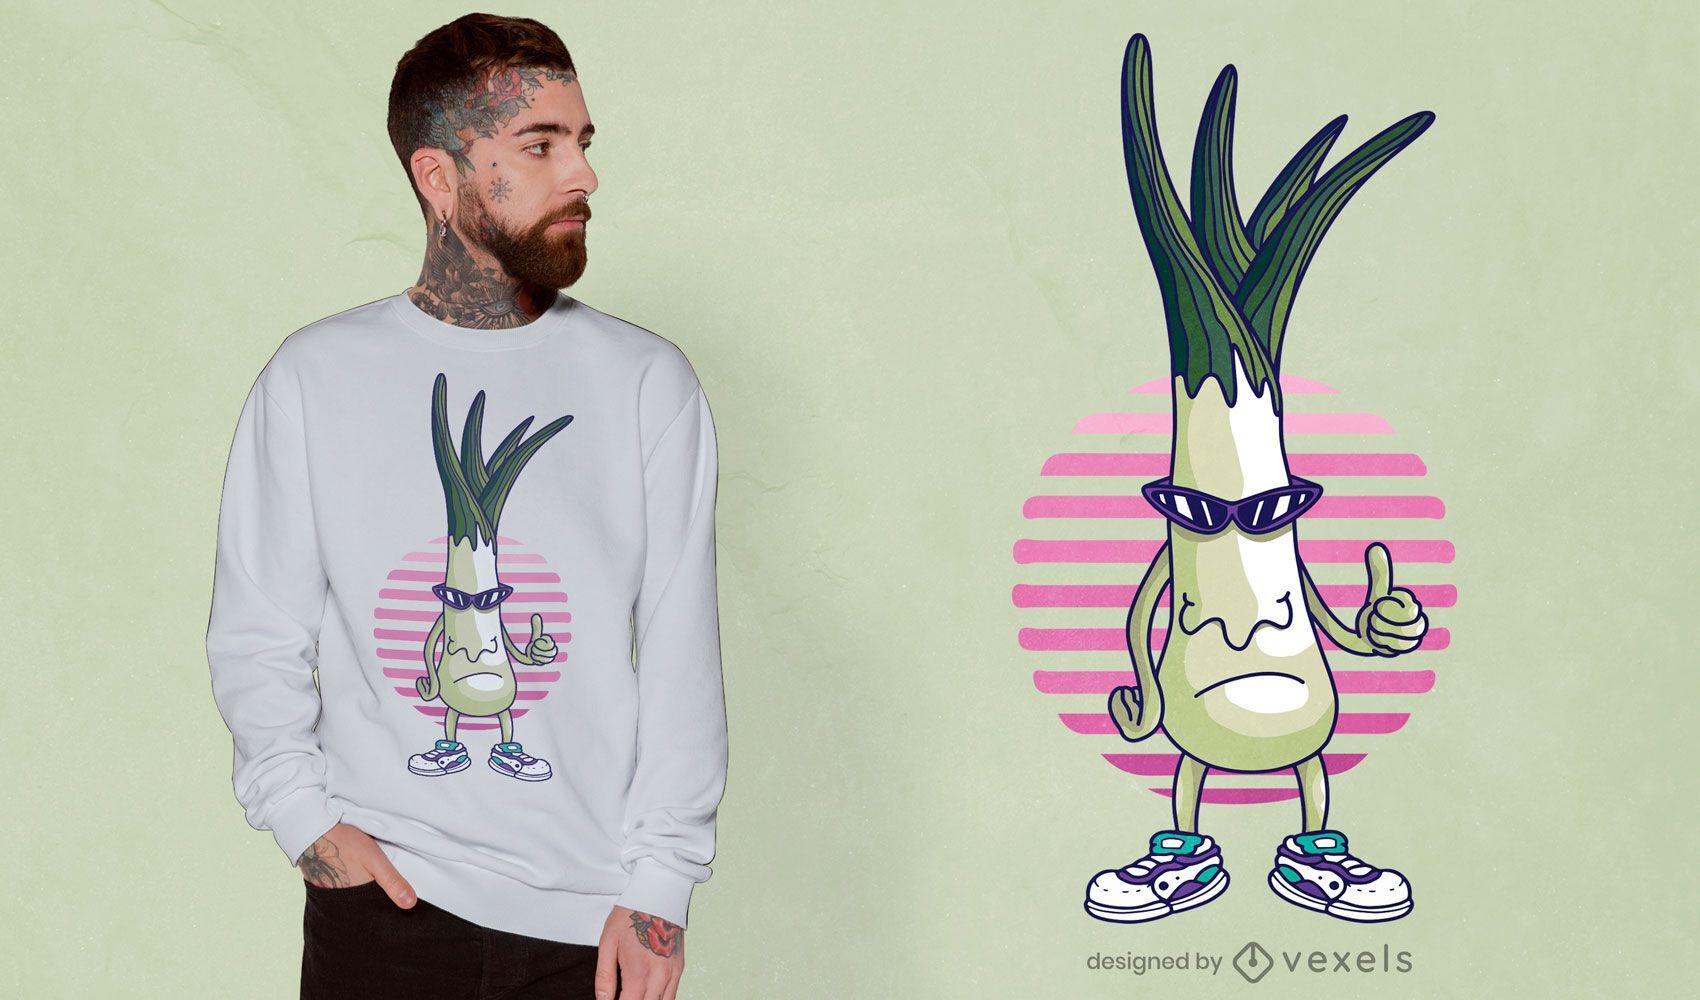 Funny leek cartoon t-shirt design